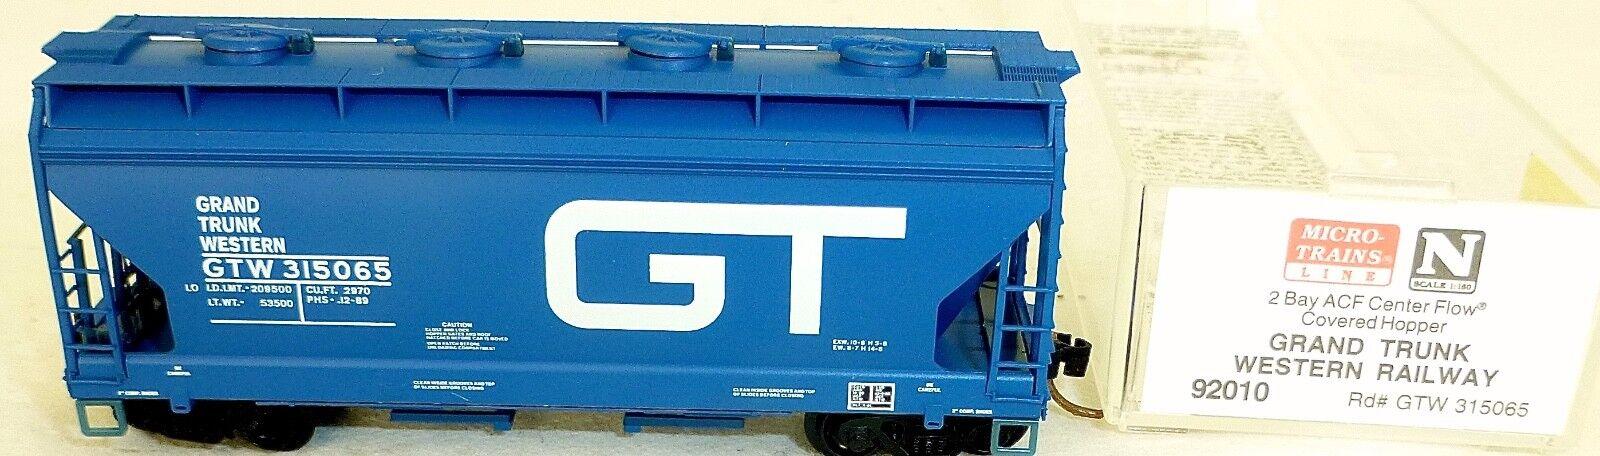 Micro-trains line 92010 2bay ACF Centerflow grand trunk western 65 n 1 160 x para